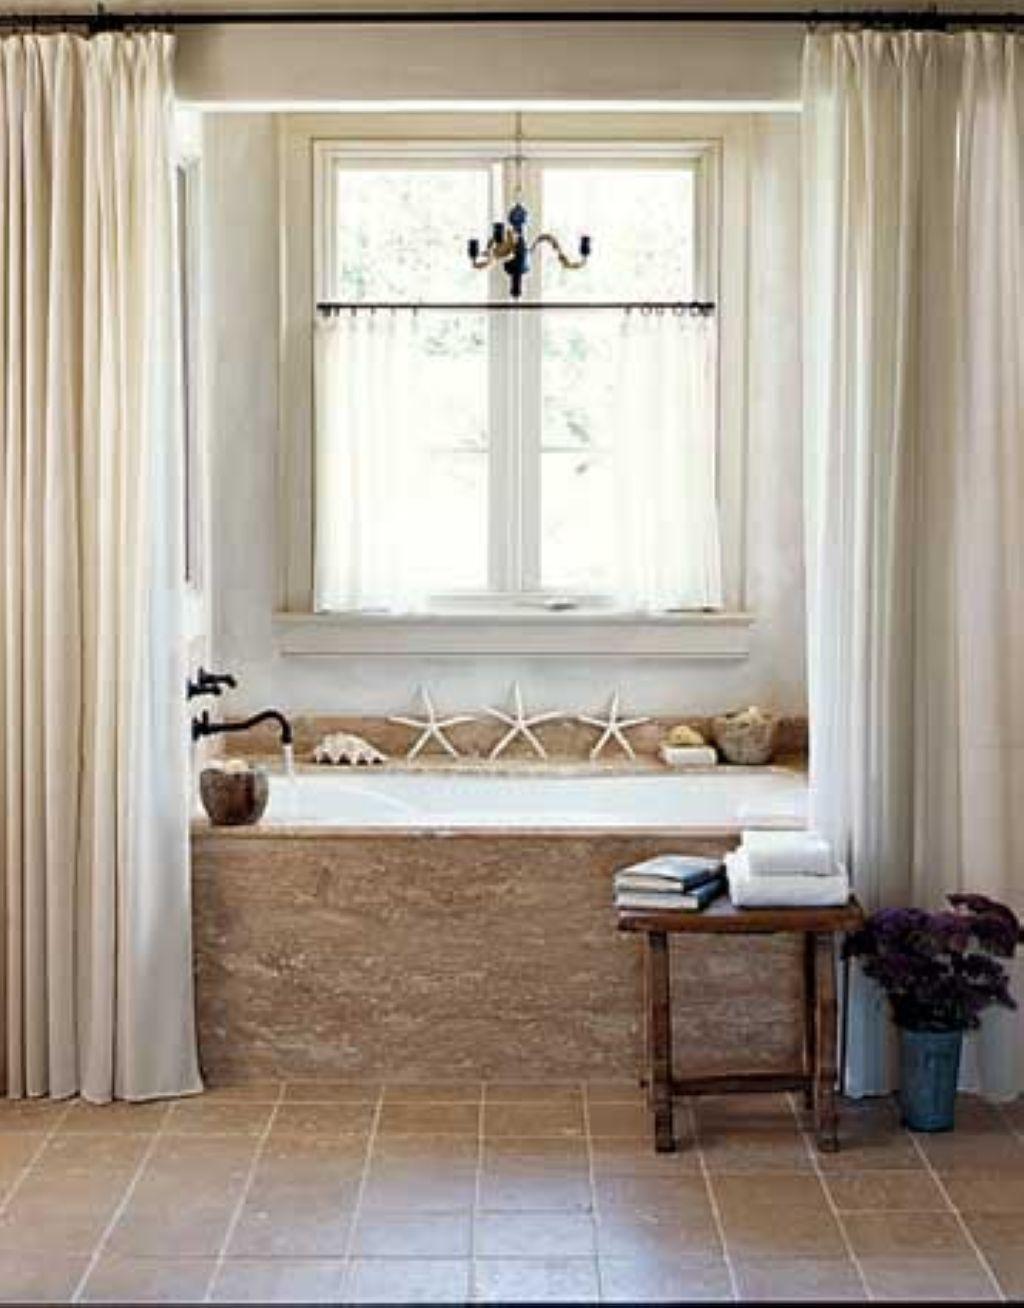 41 Beautiful Tiles Around Shower Window   Shower window, Window and Bath